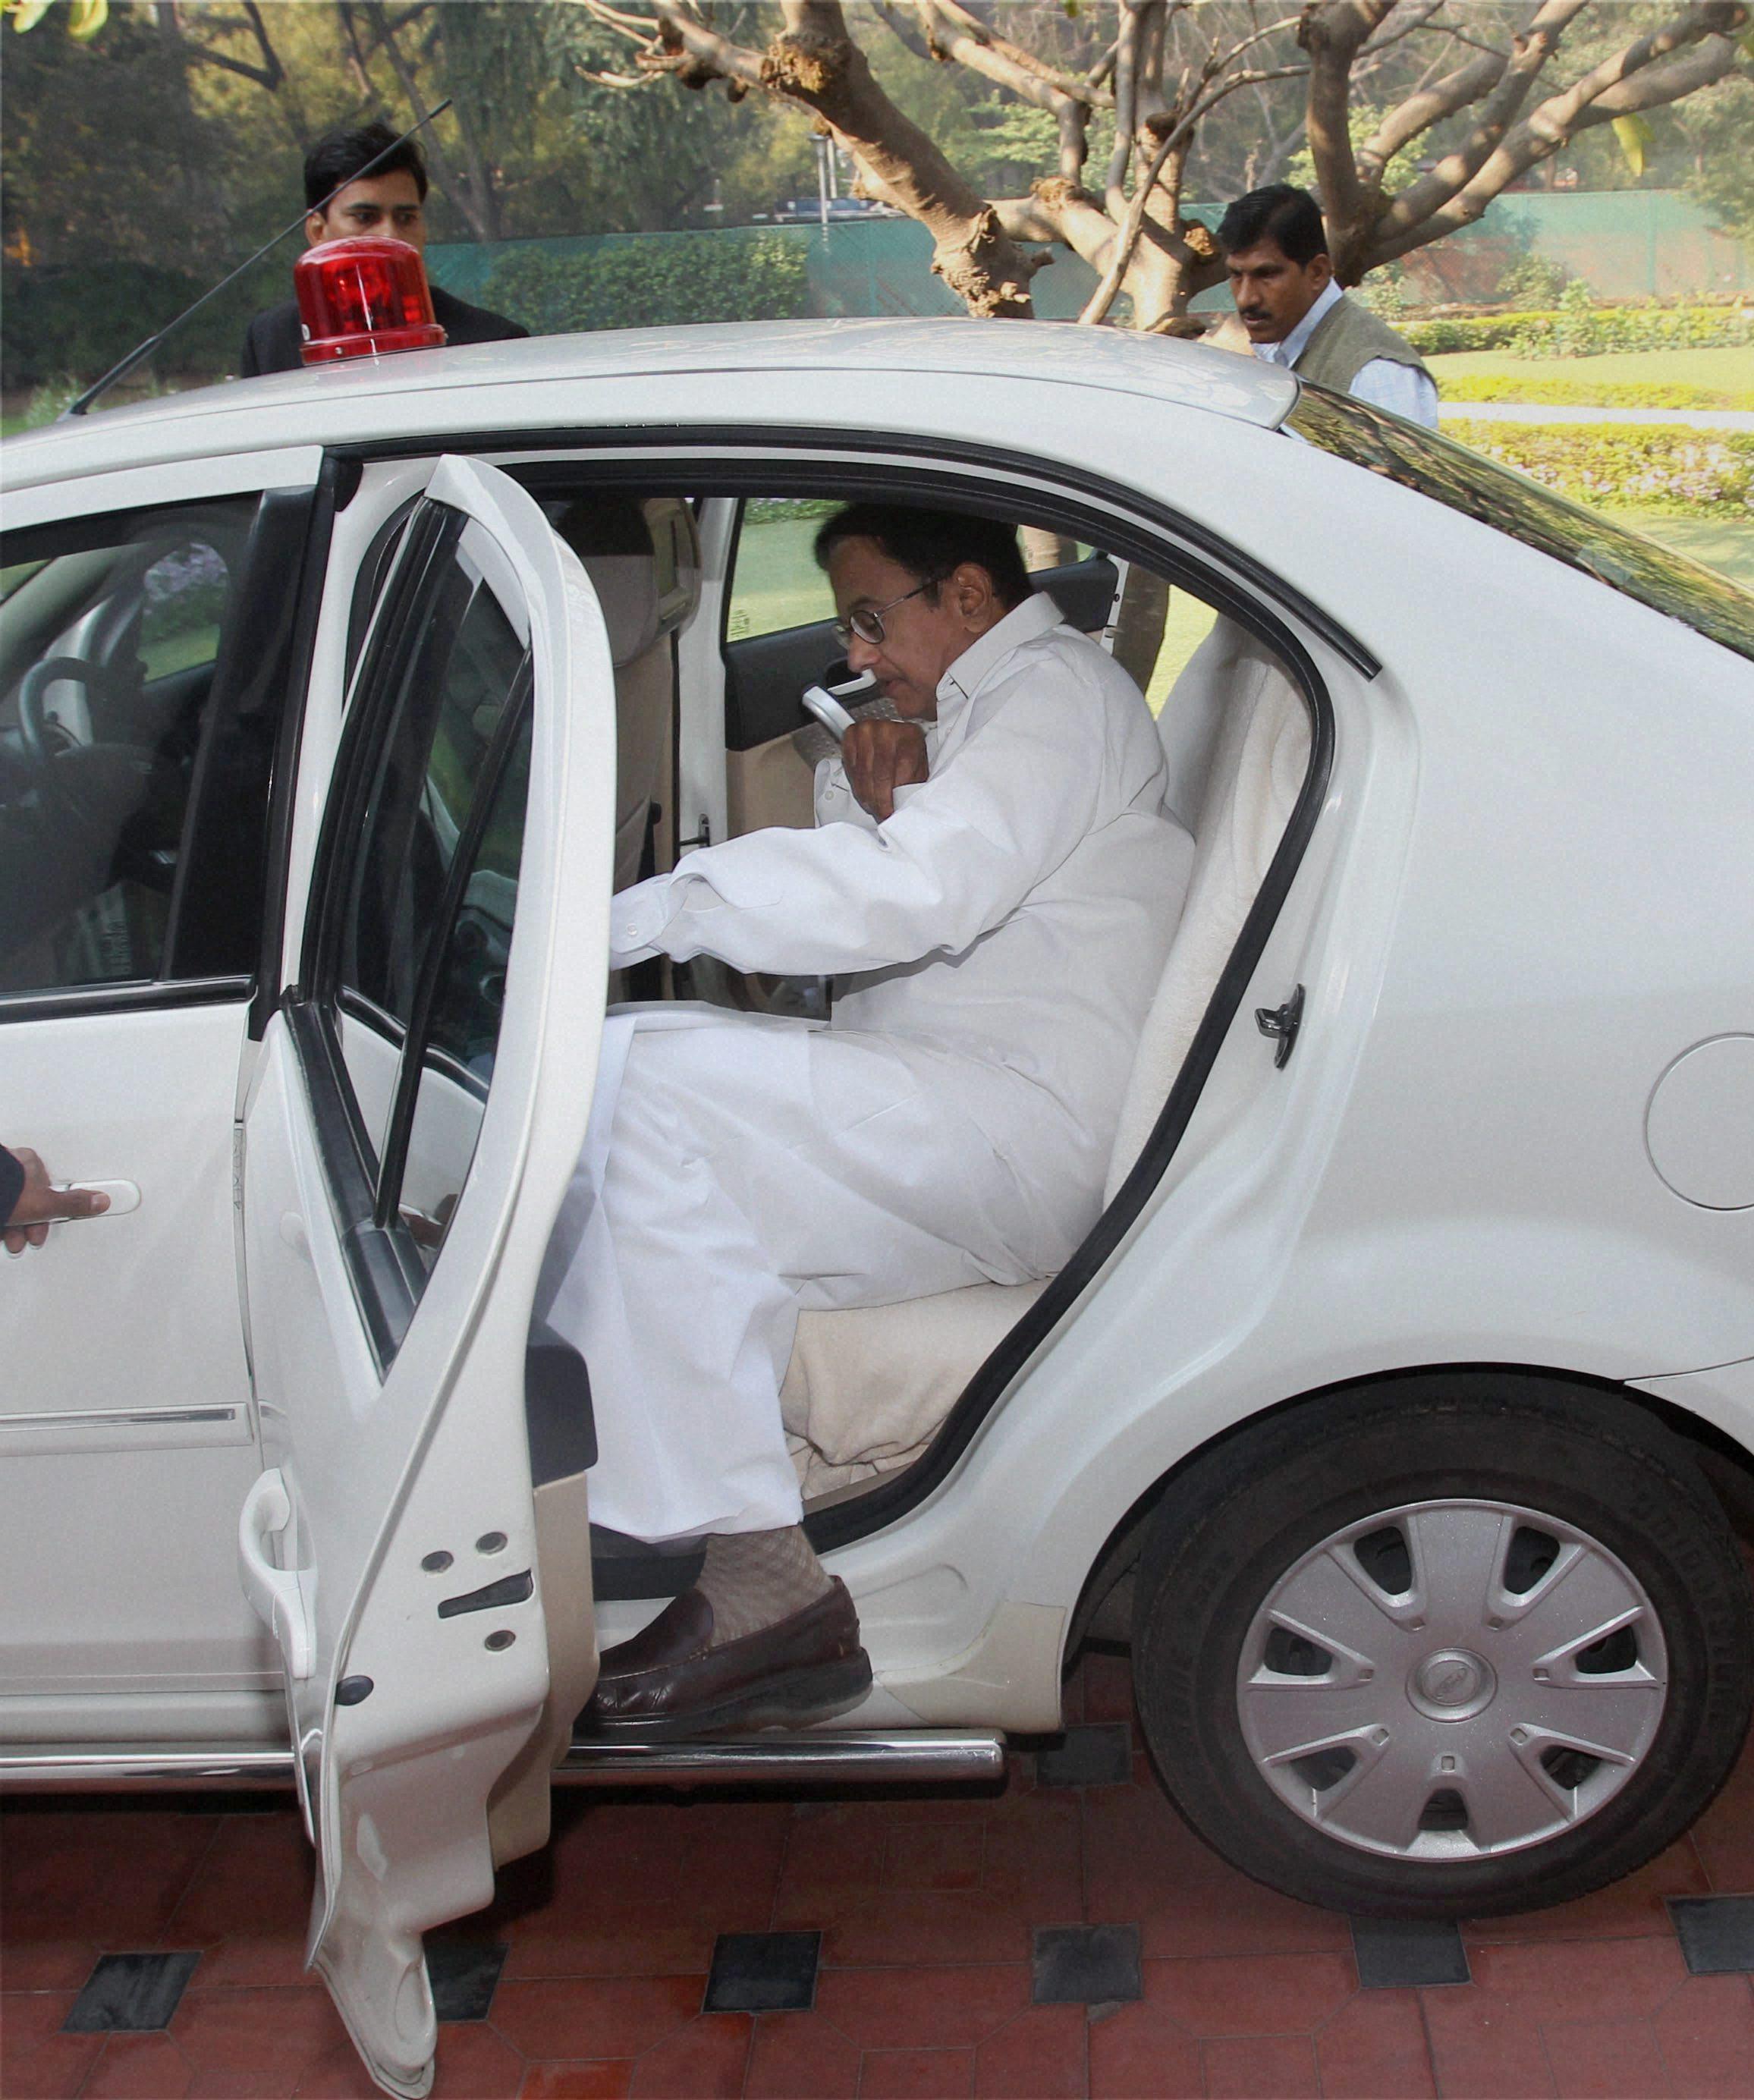 Chidambaram gets into the car.